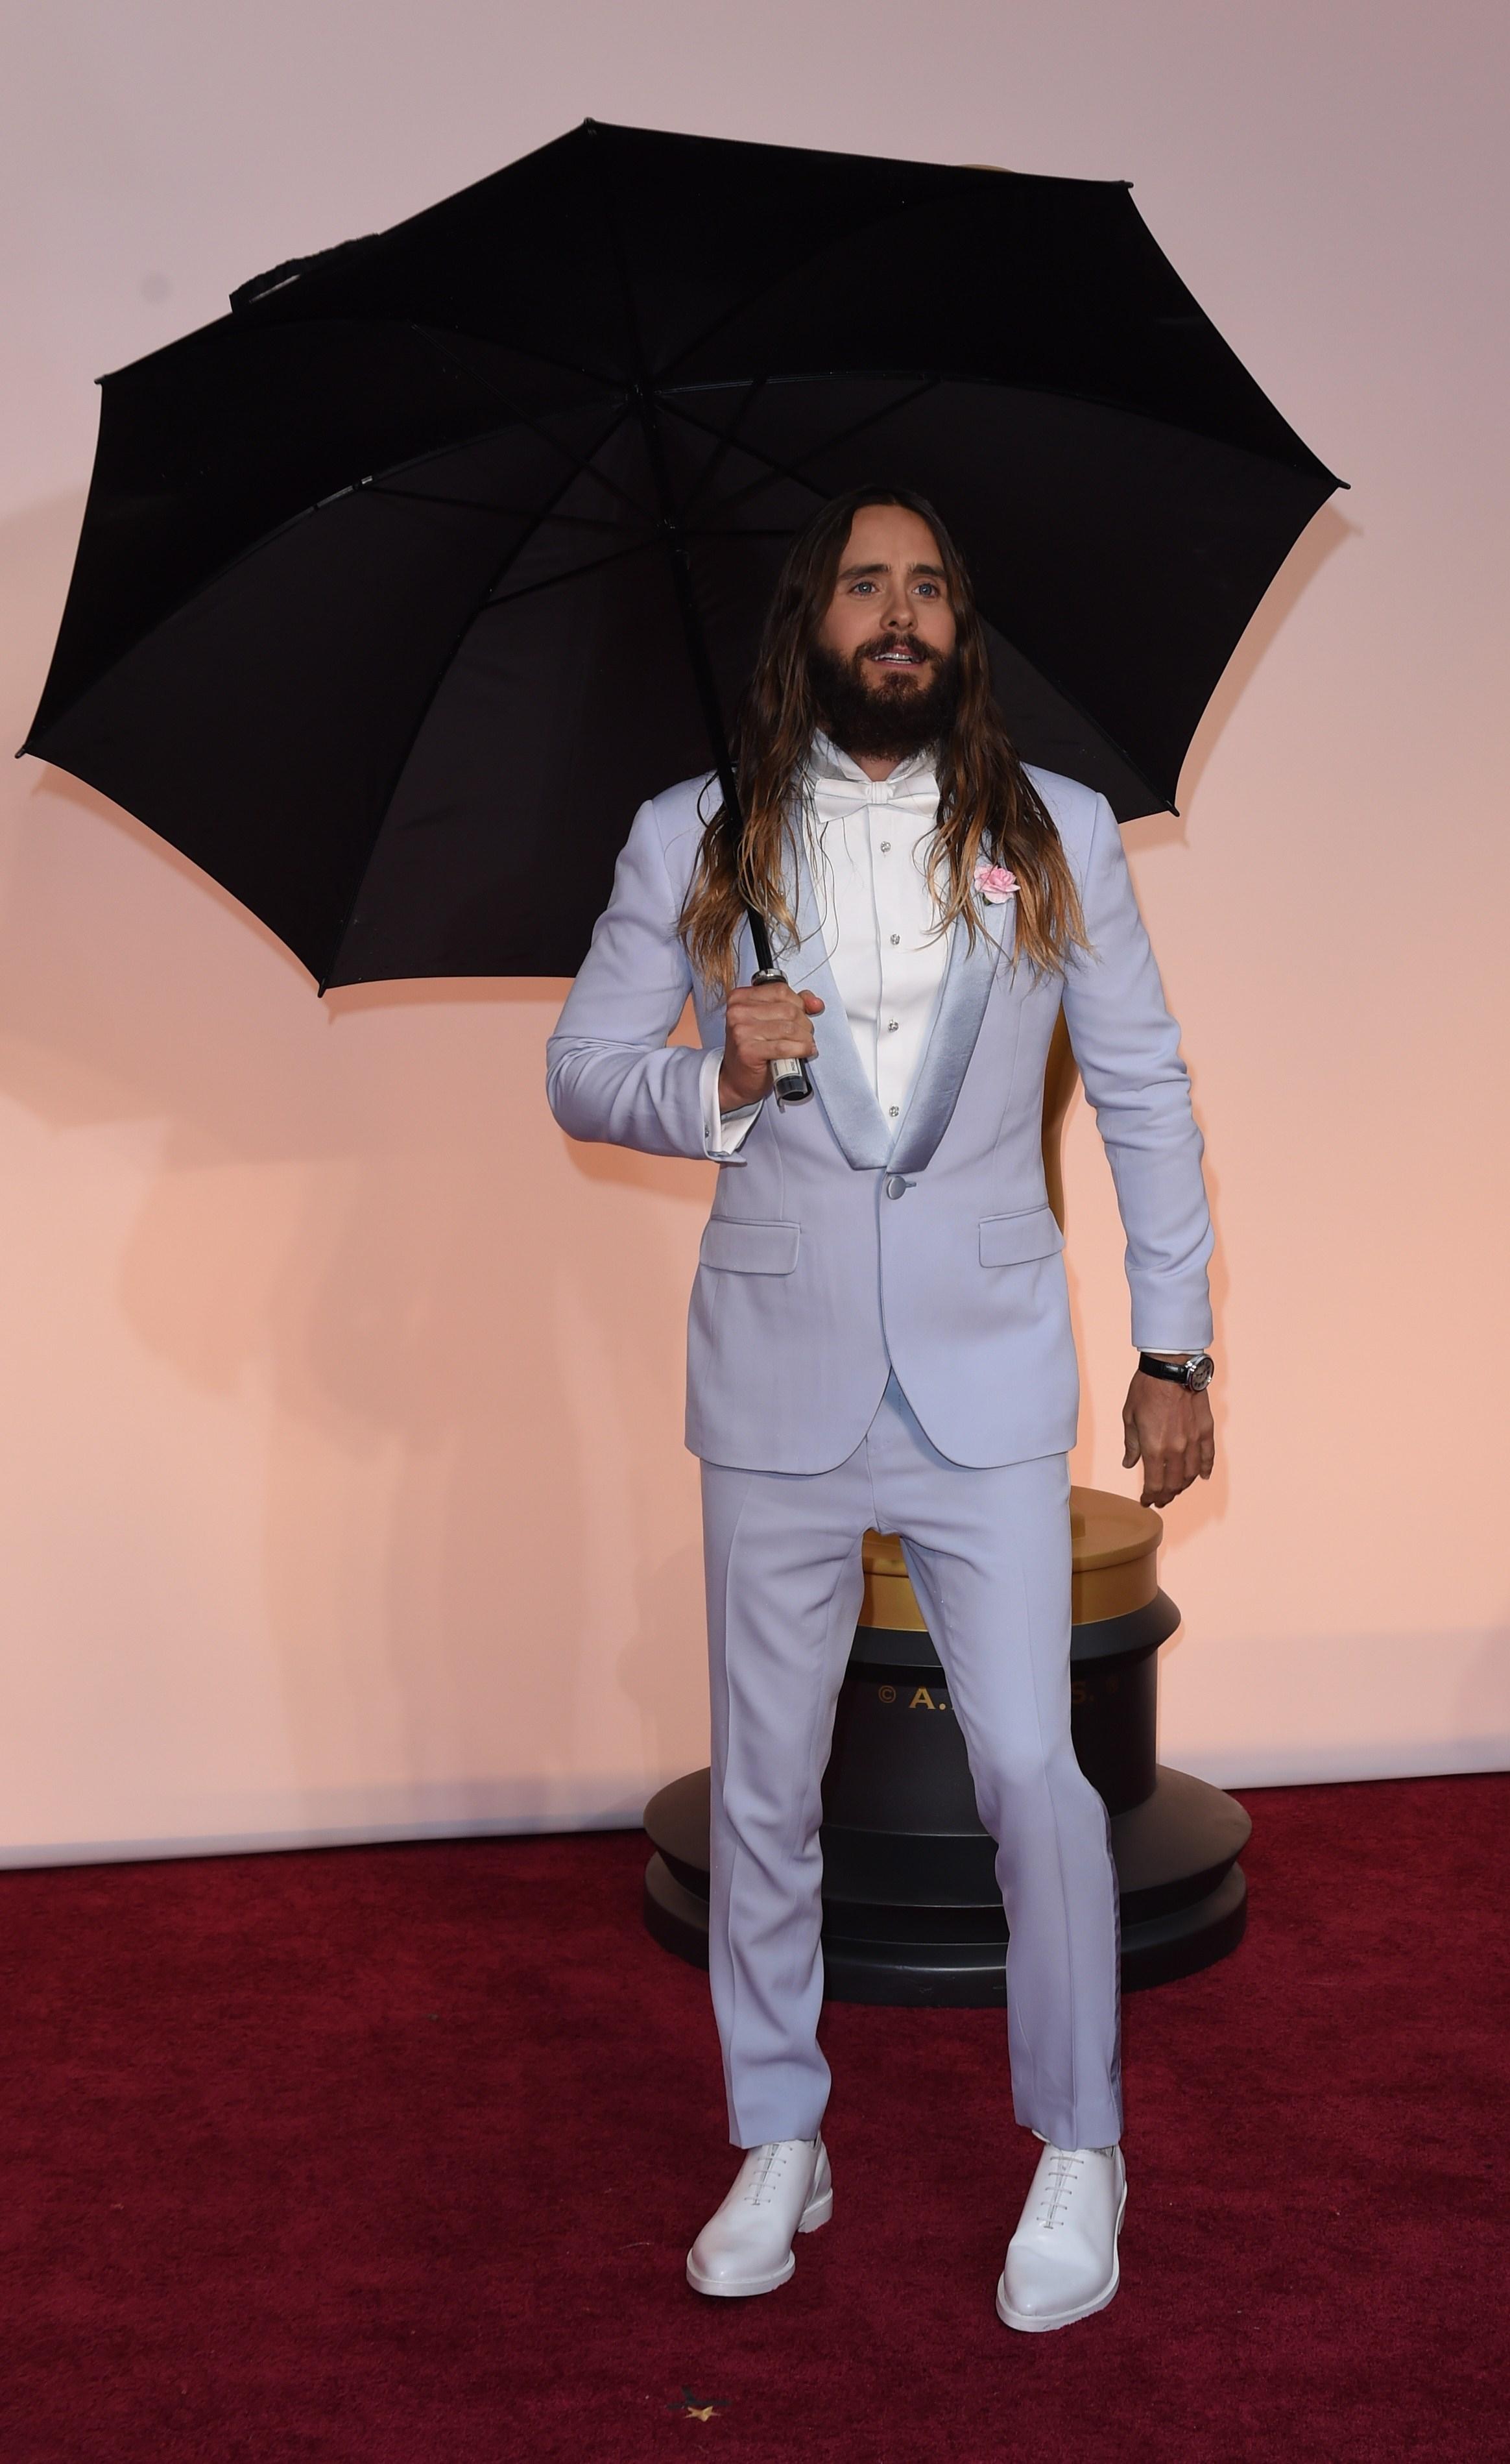 Jared Leto's Giant Umbrella